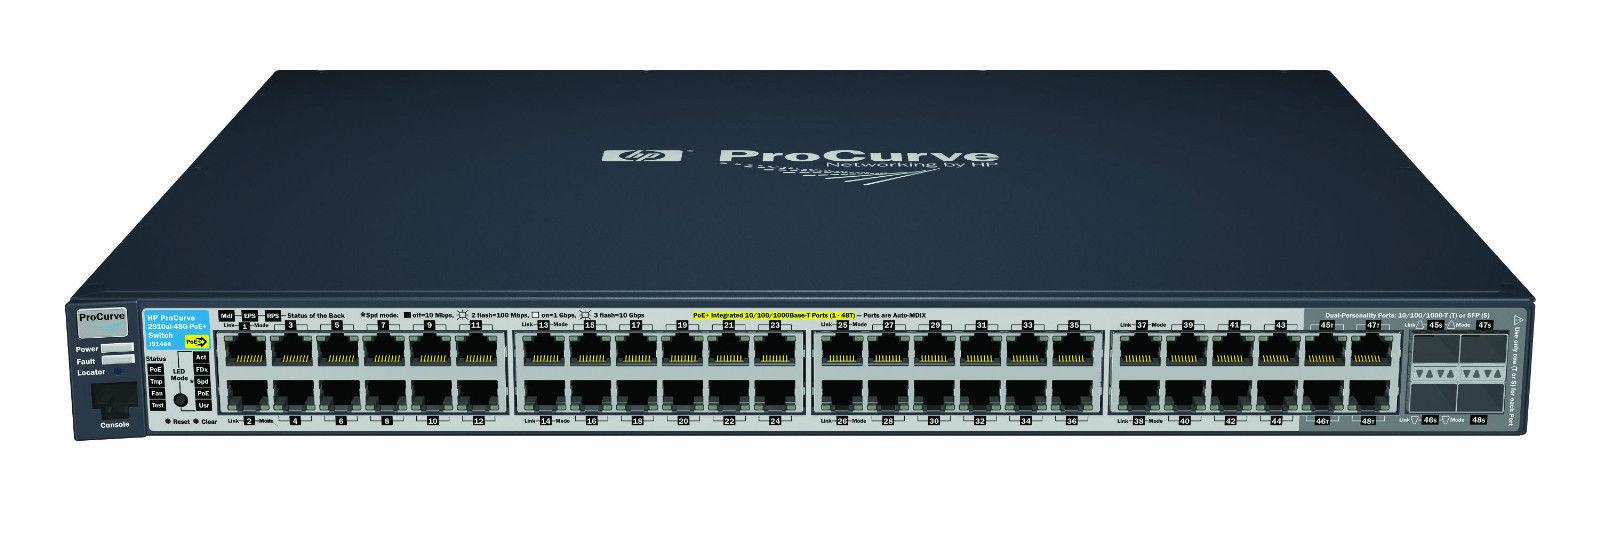 HPE J9148A 48-Port Switch